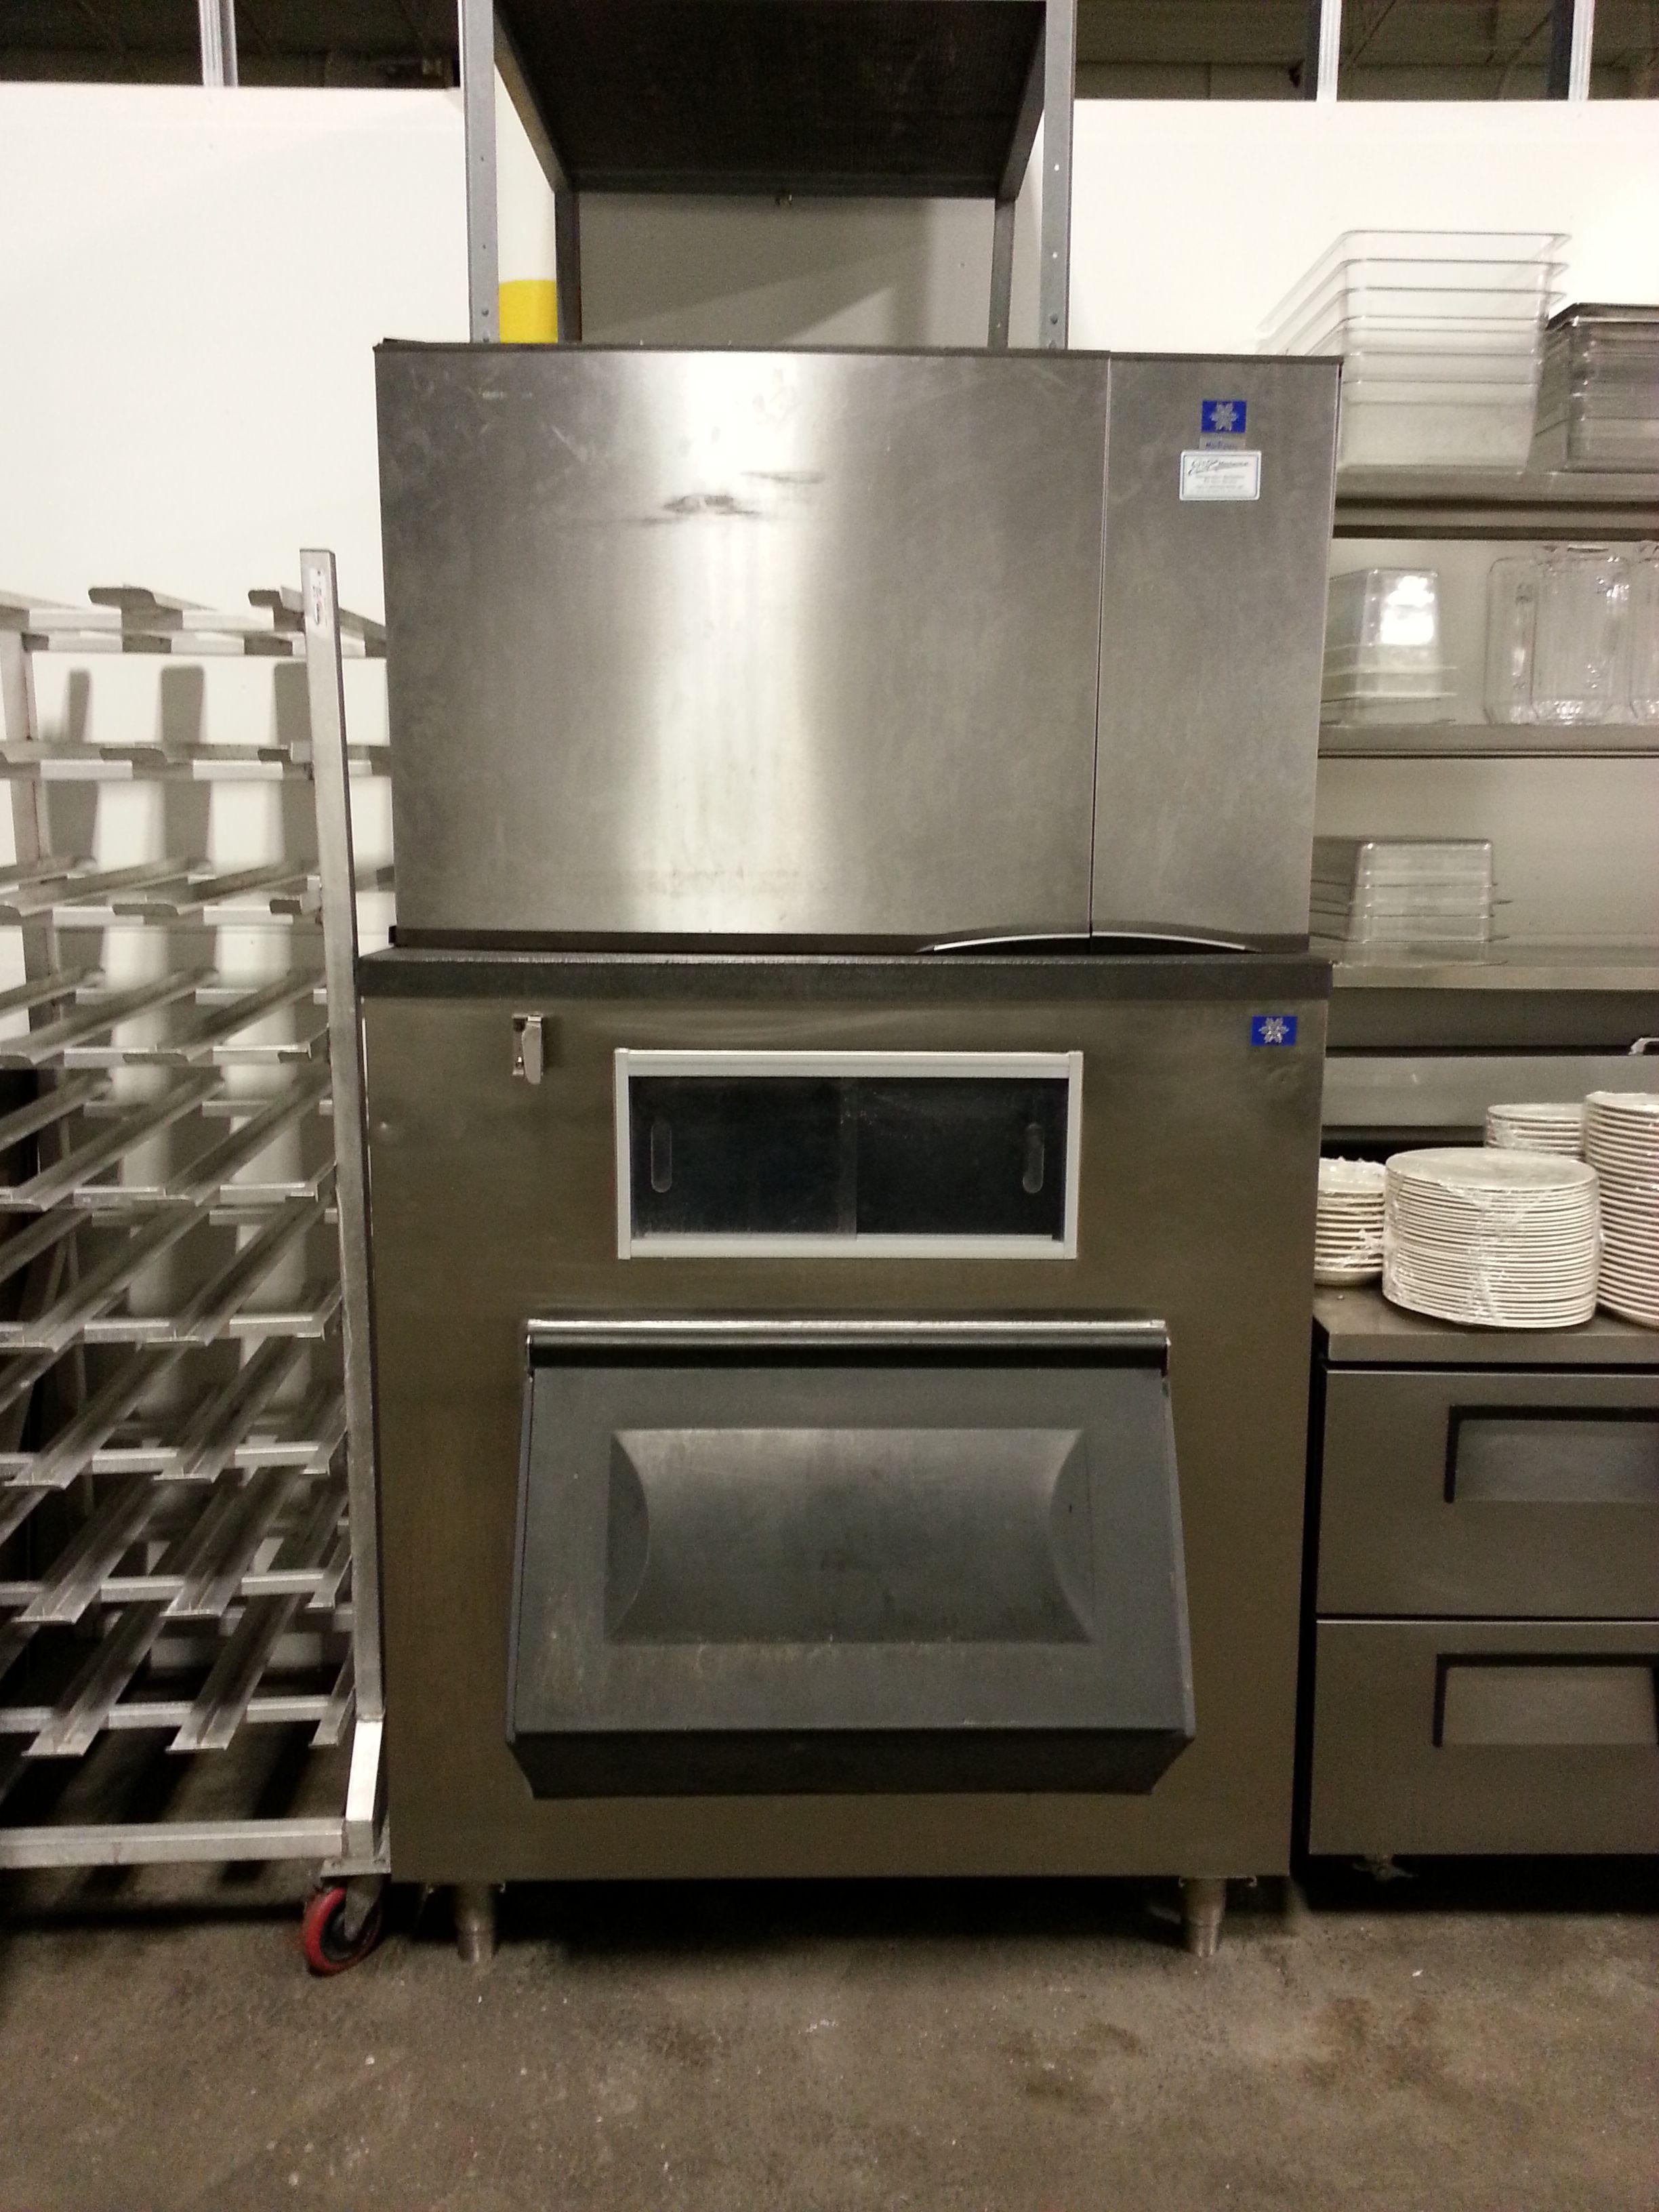 Manitowac High Volume Ice Machine Cost New Over 10 000 3950 Manitowoc Used Equipment For Sale Ice Machine